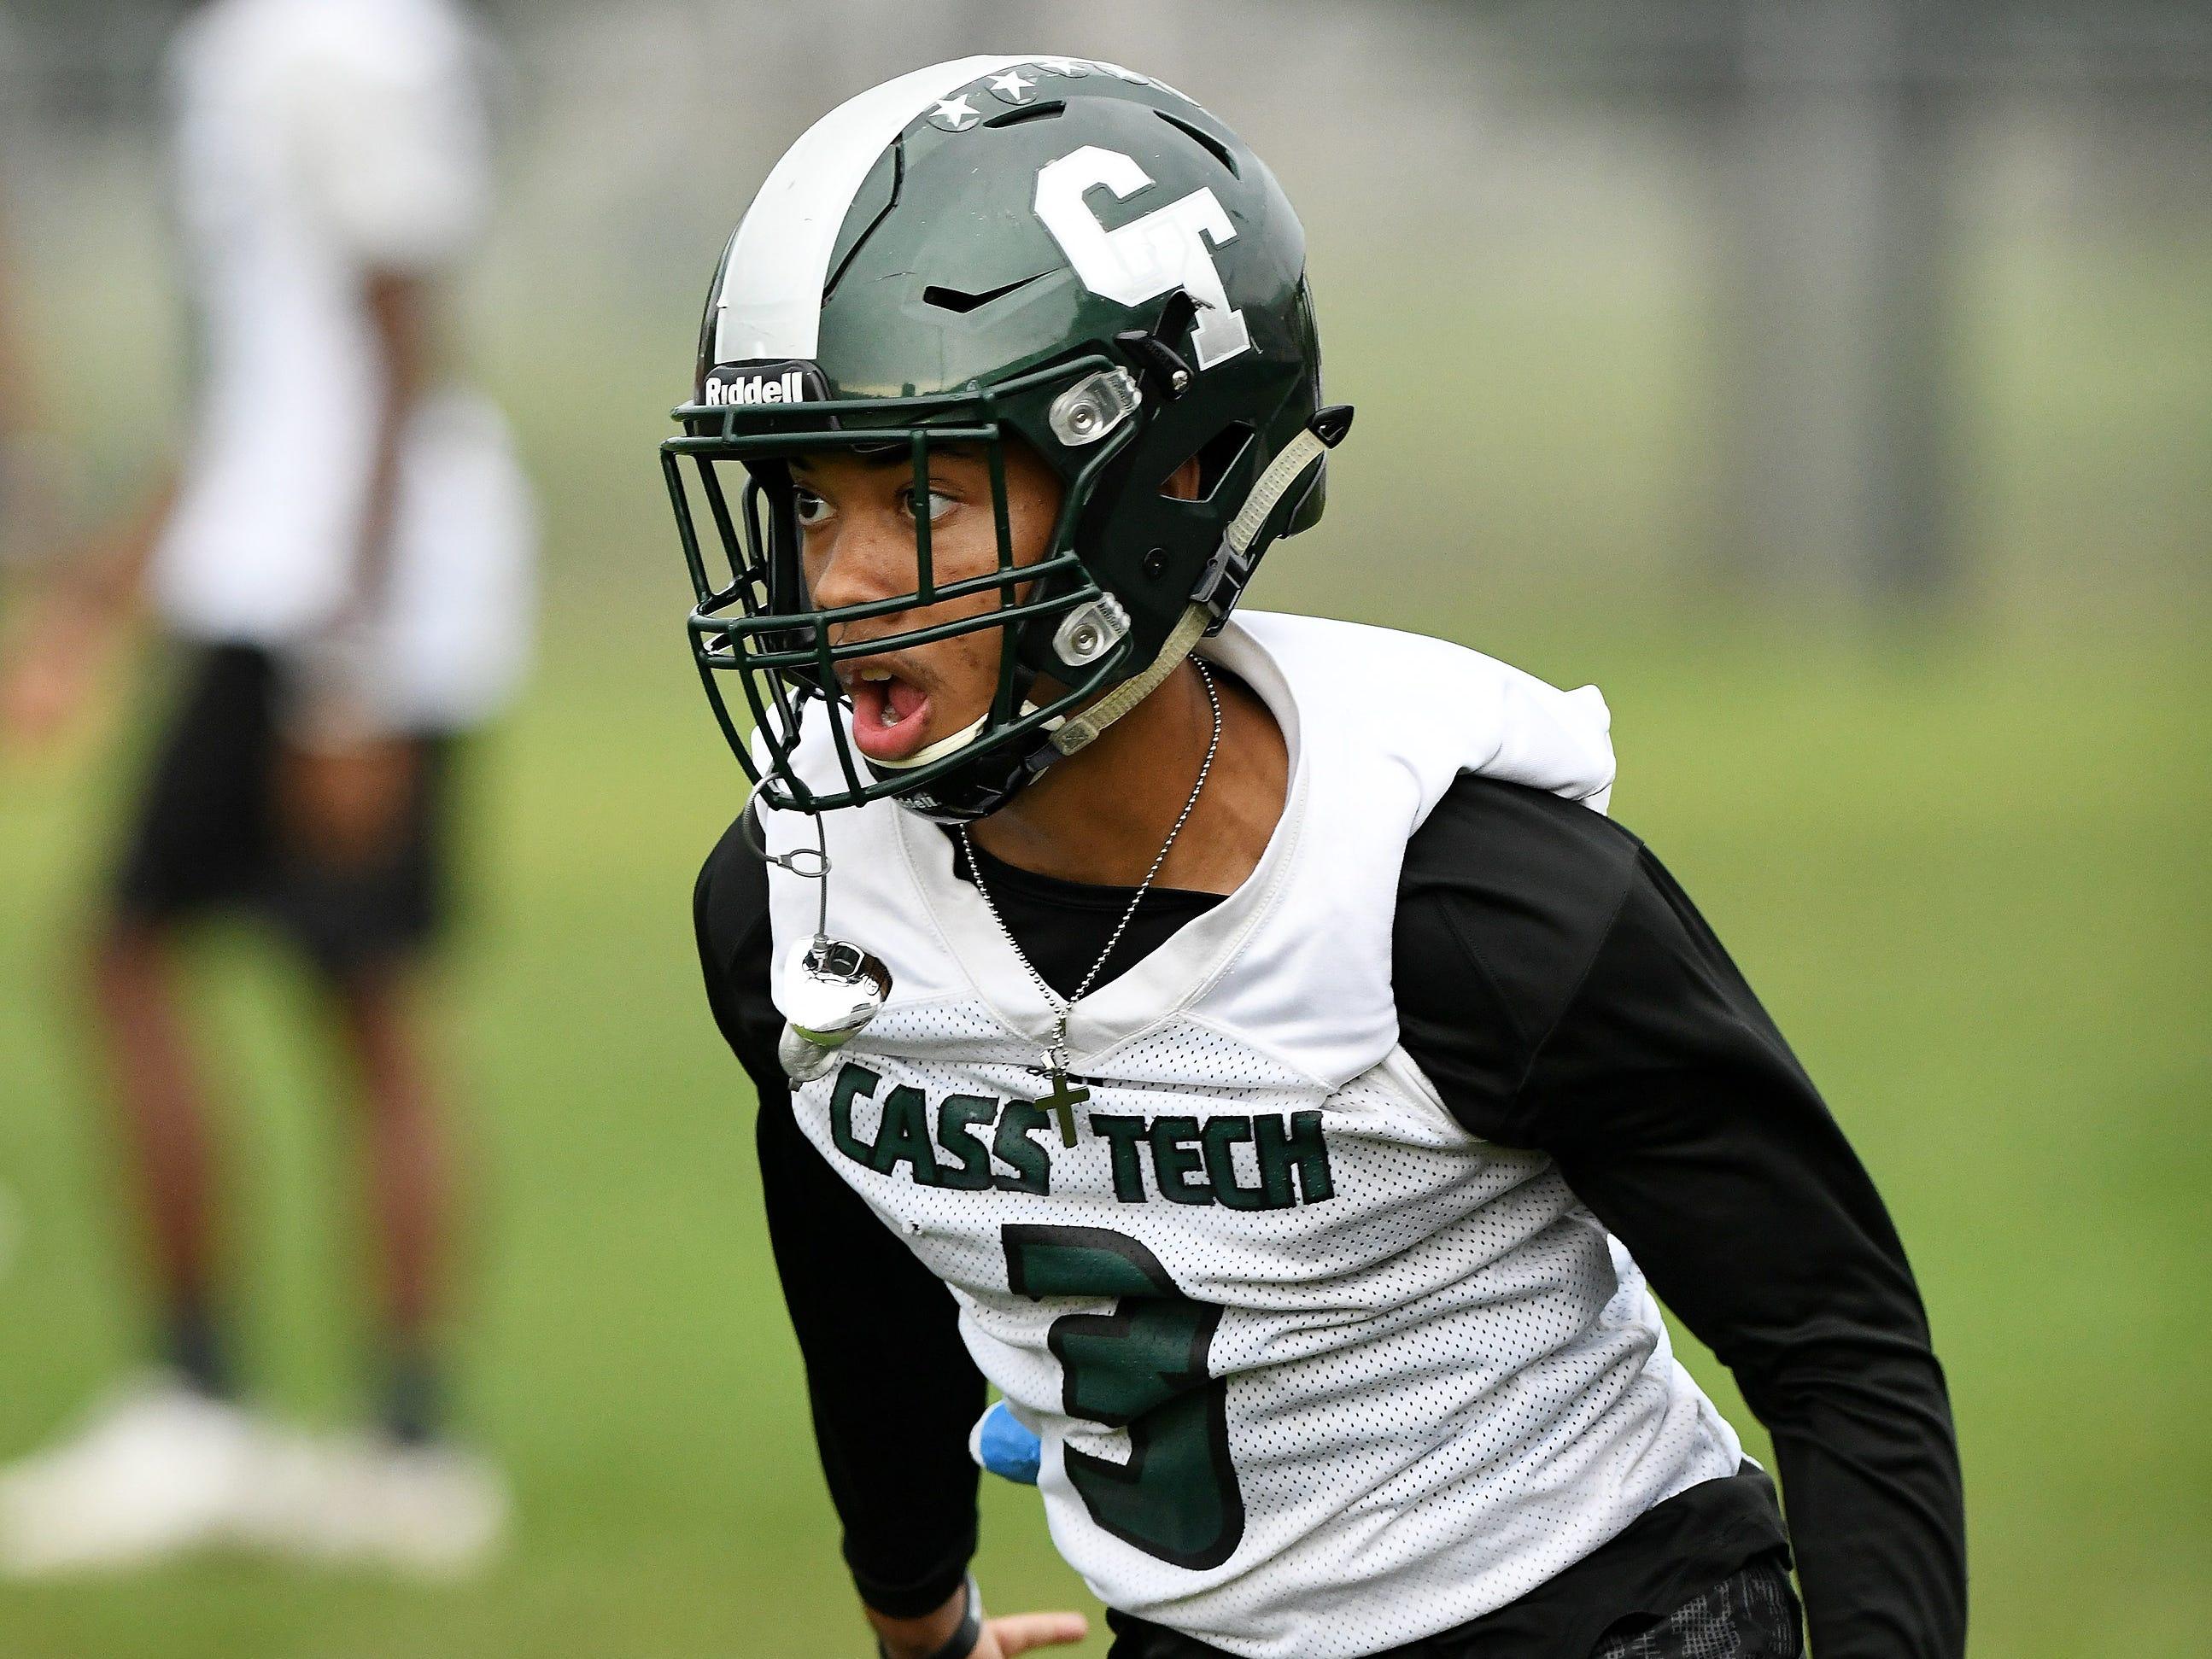 Corner back Xavier Goldsmith runs during special teams drills at football practice.